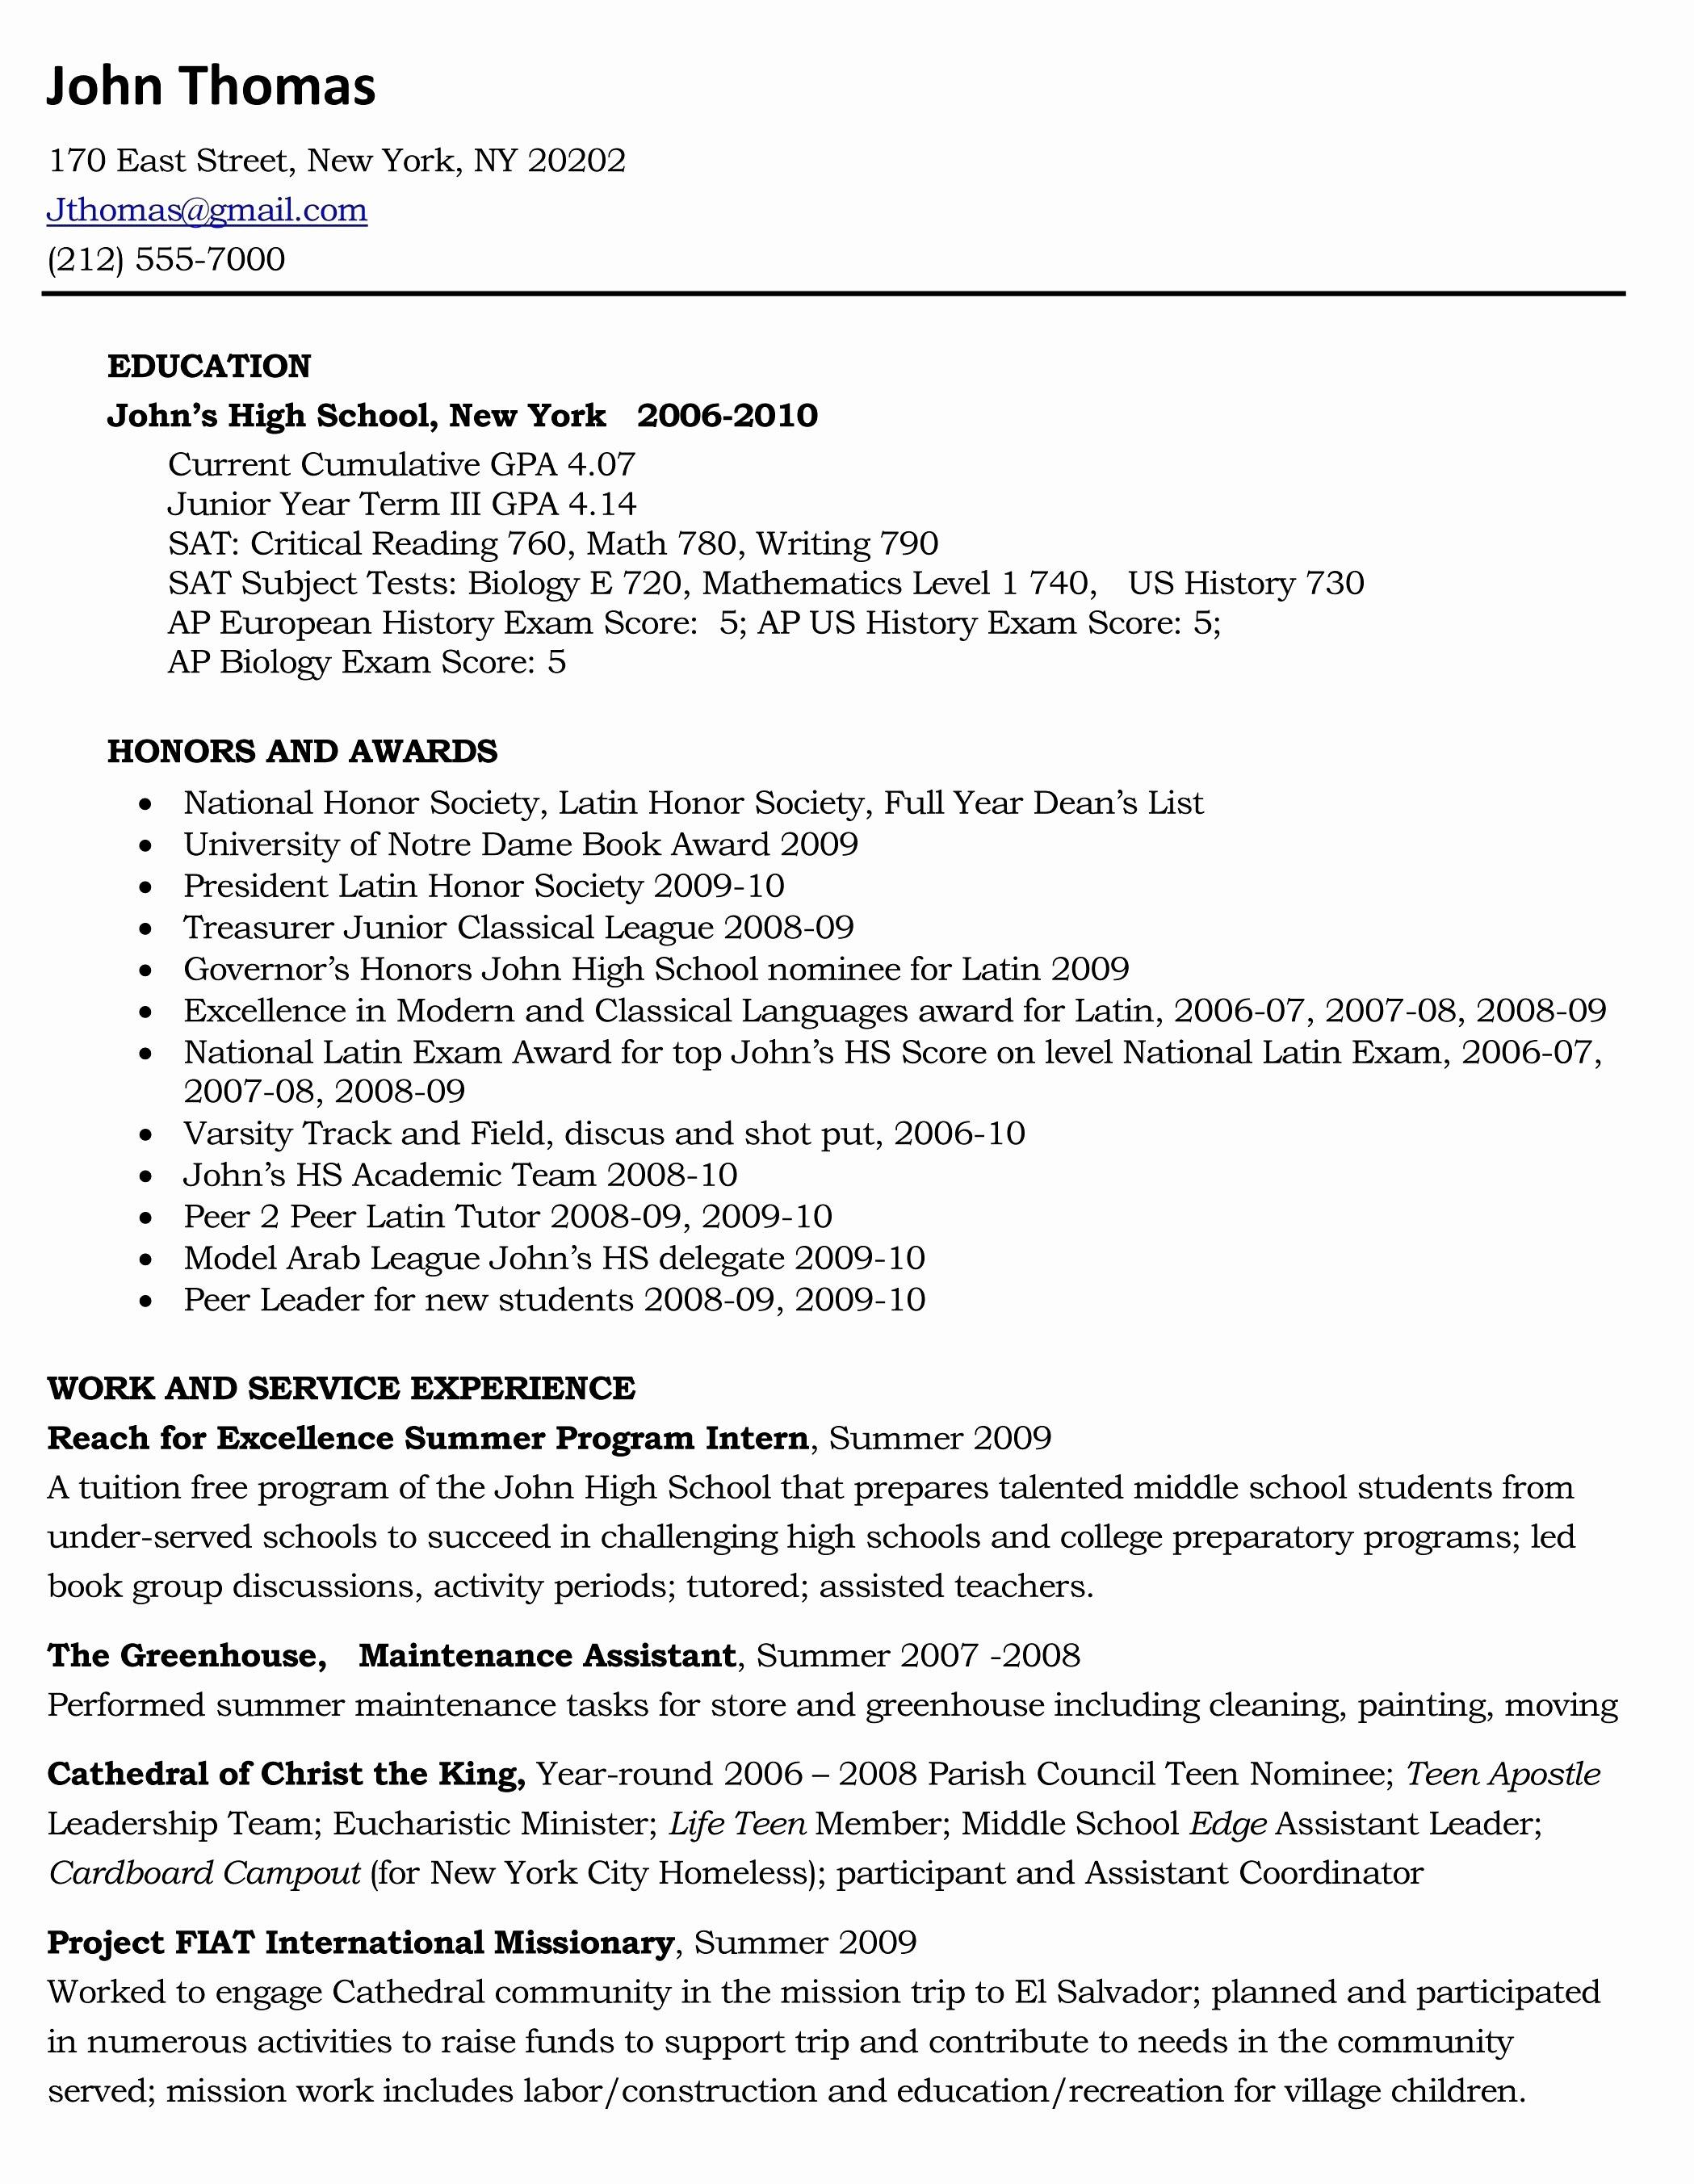 Missionary Letter Template - Resume Portfolio Template Inspirational Resume Portfolio Template